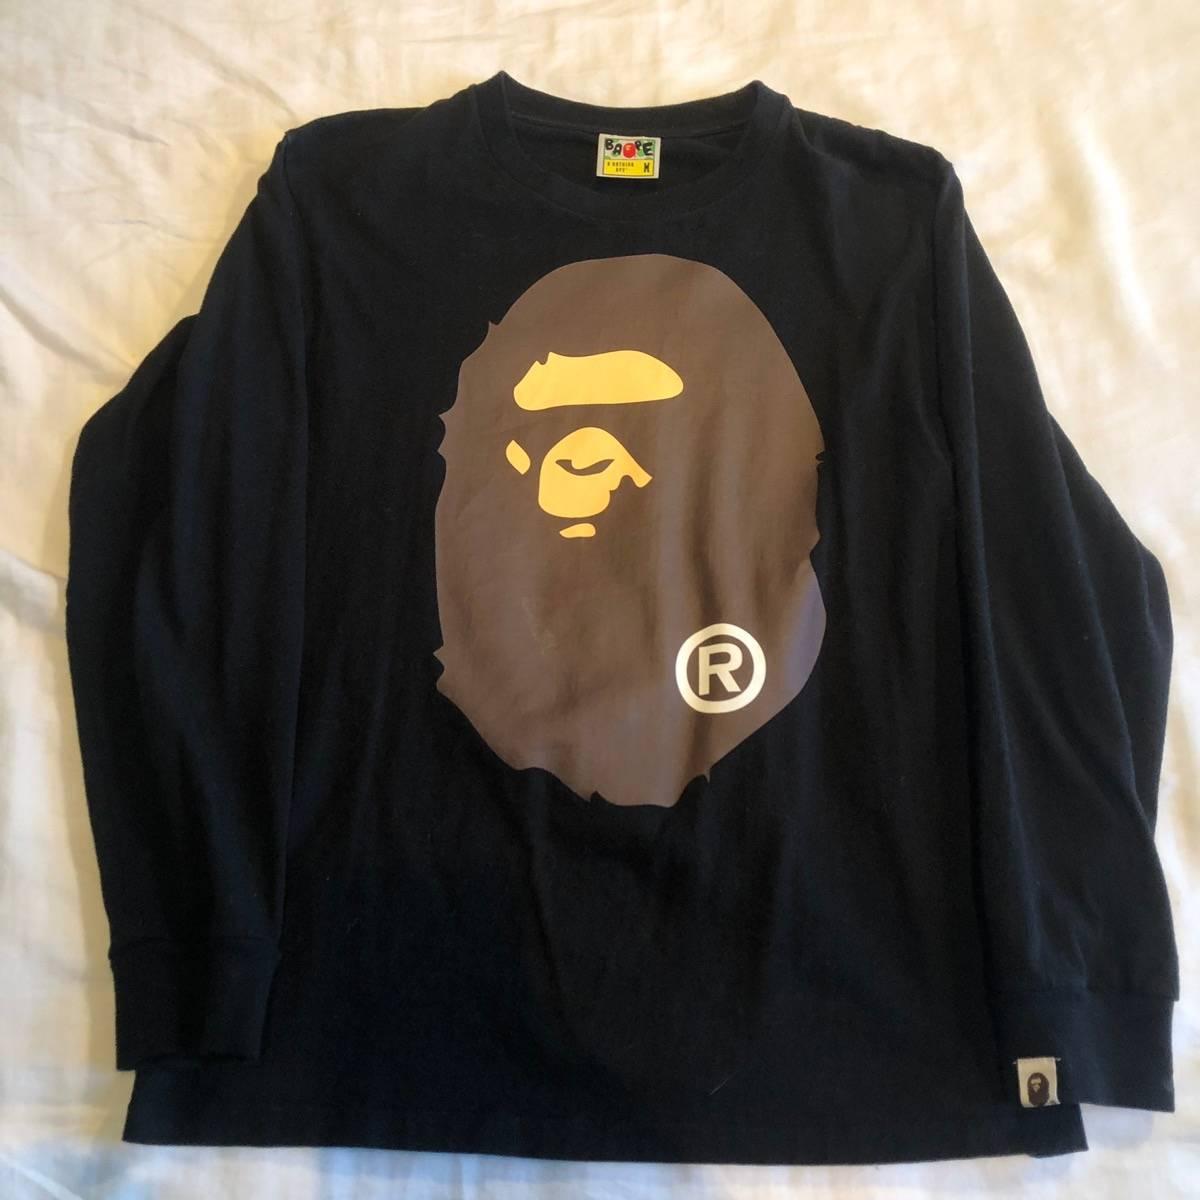 7ad31fbb Bape Bape By A Bathing Ape Head Long Sleeve Shirt | Grailed